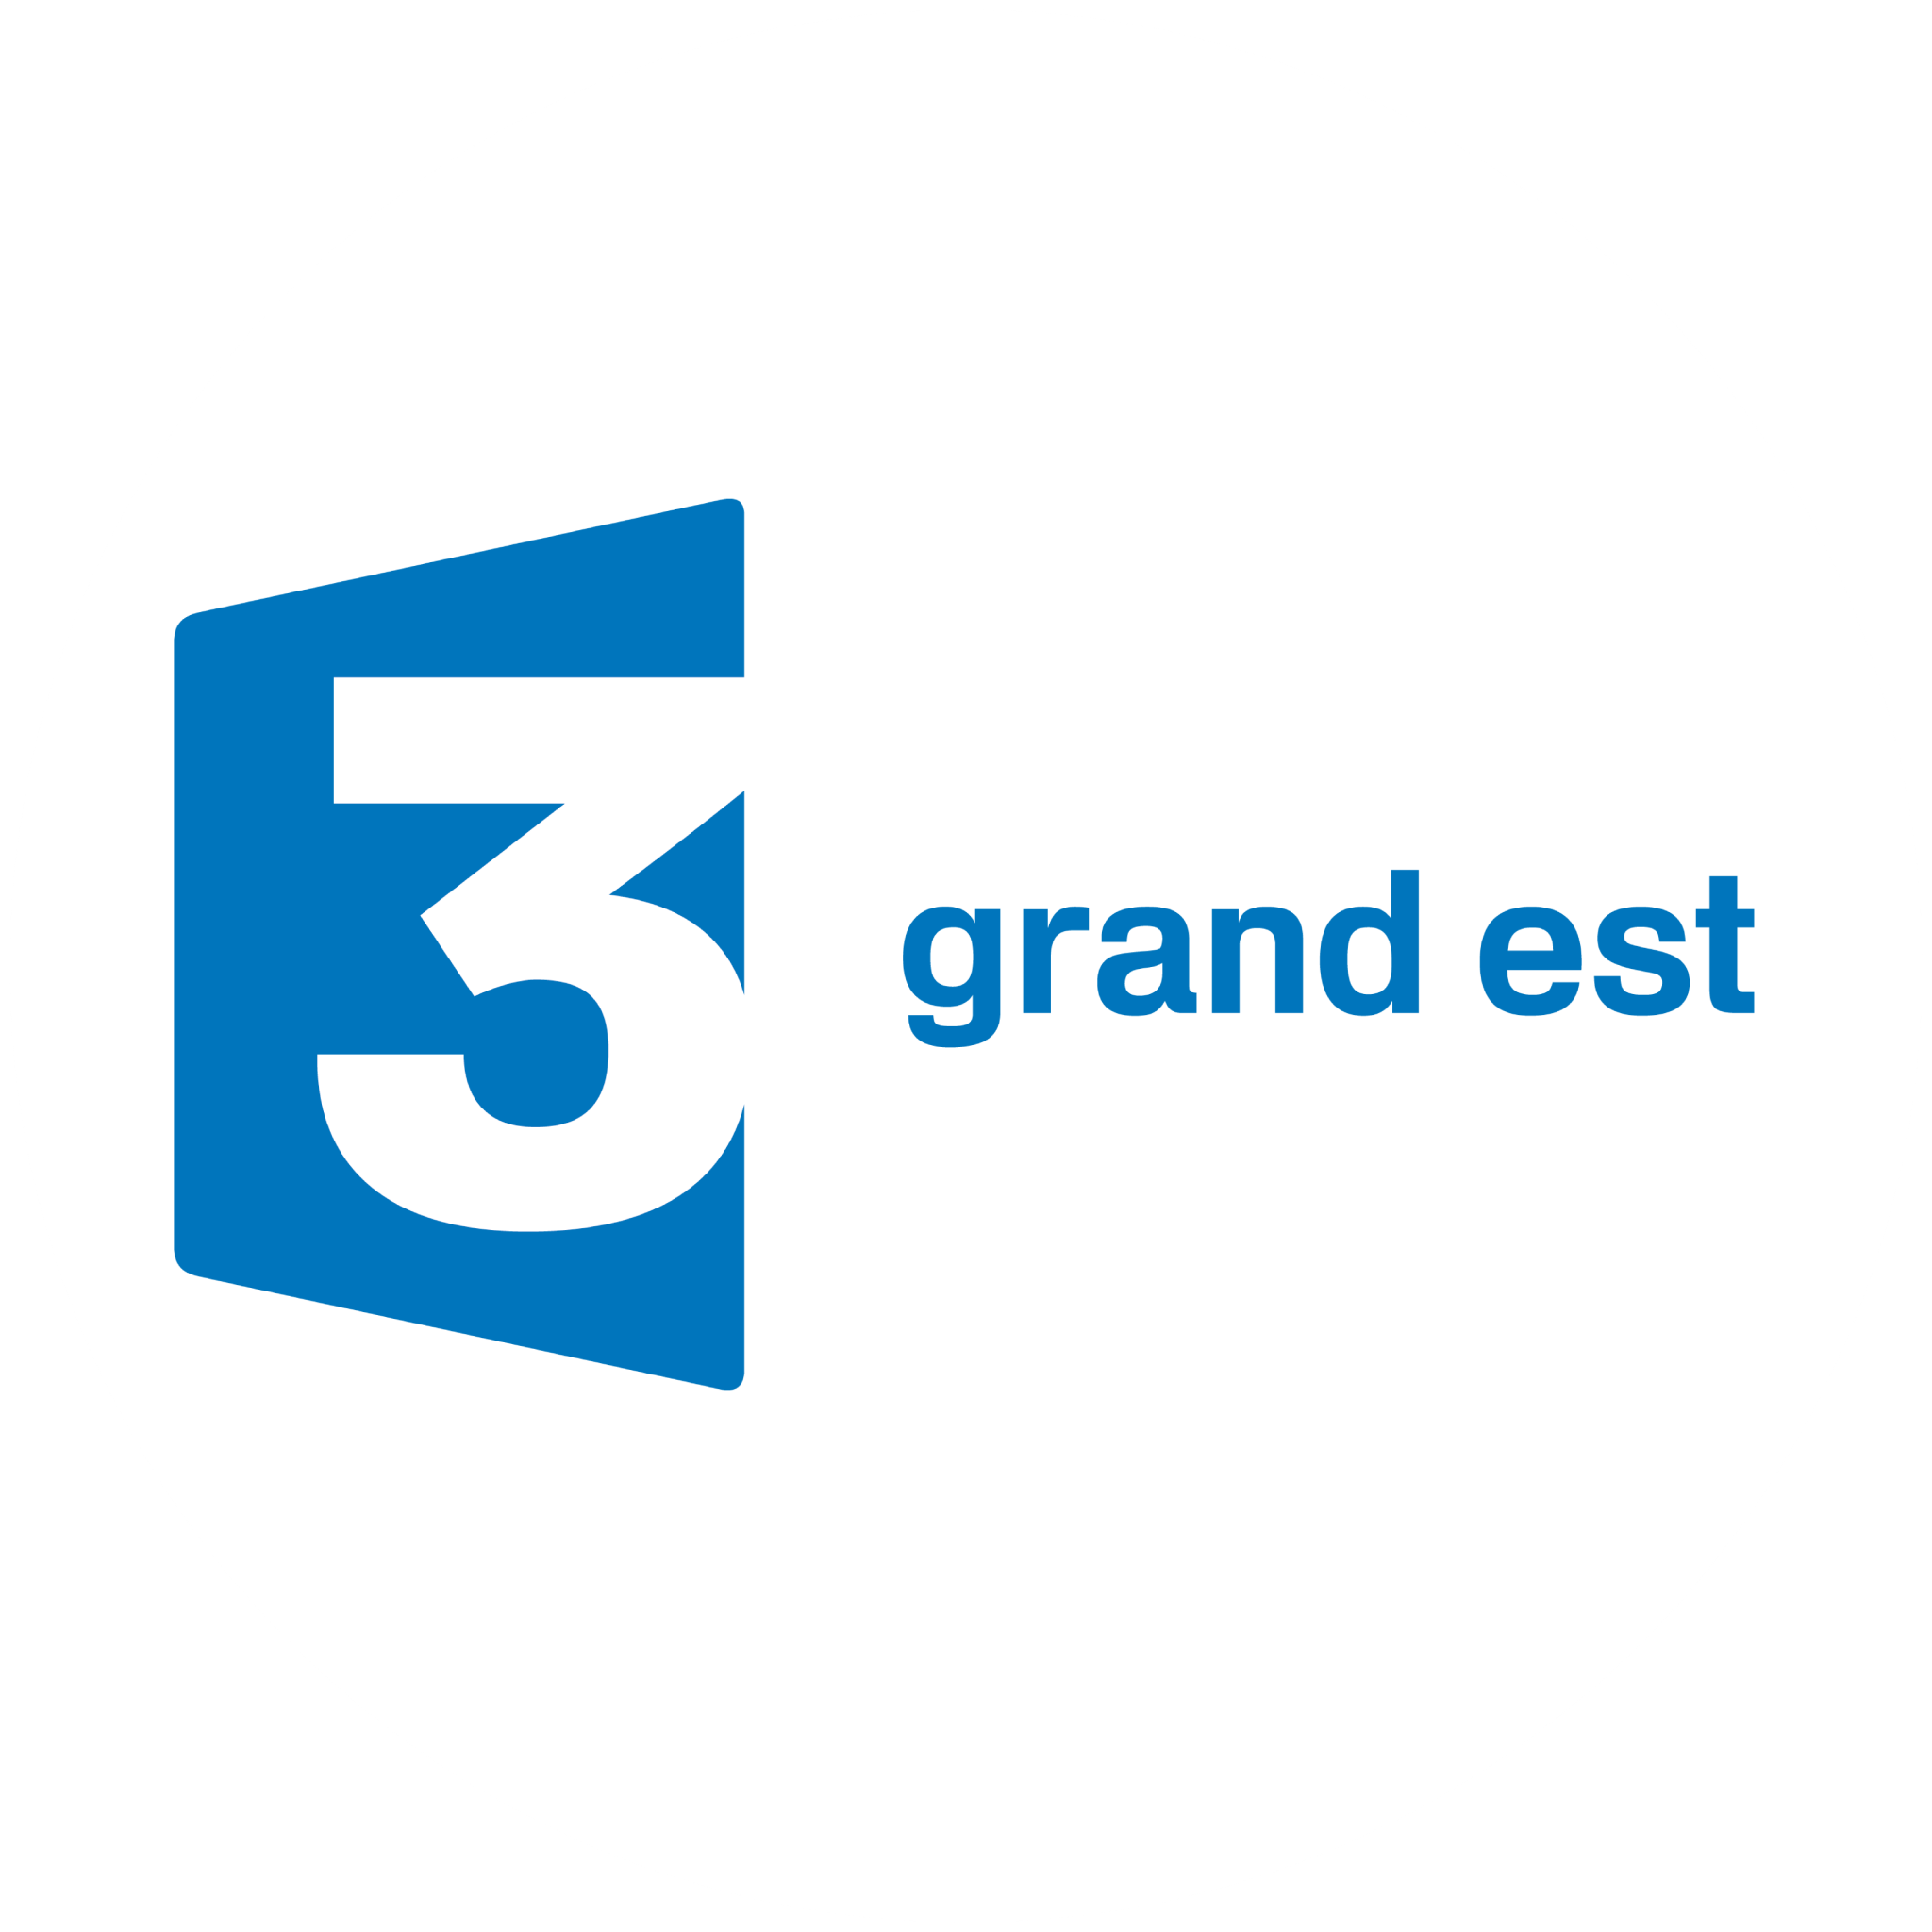 MF_France 3